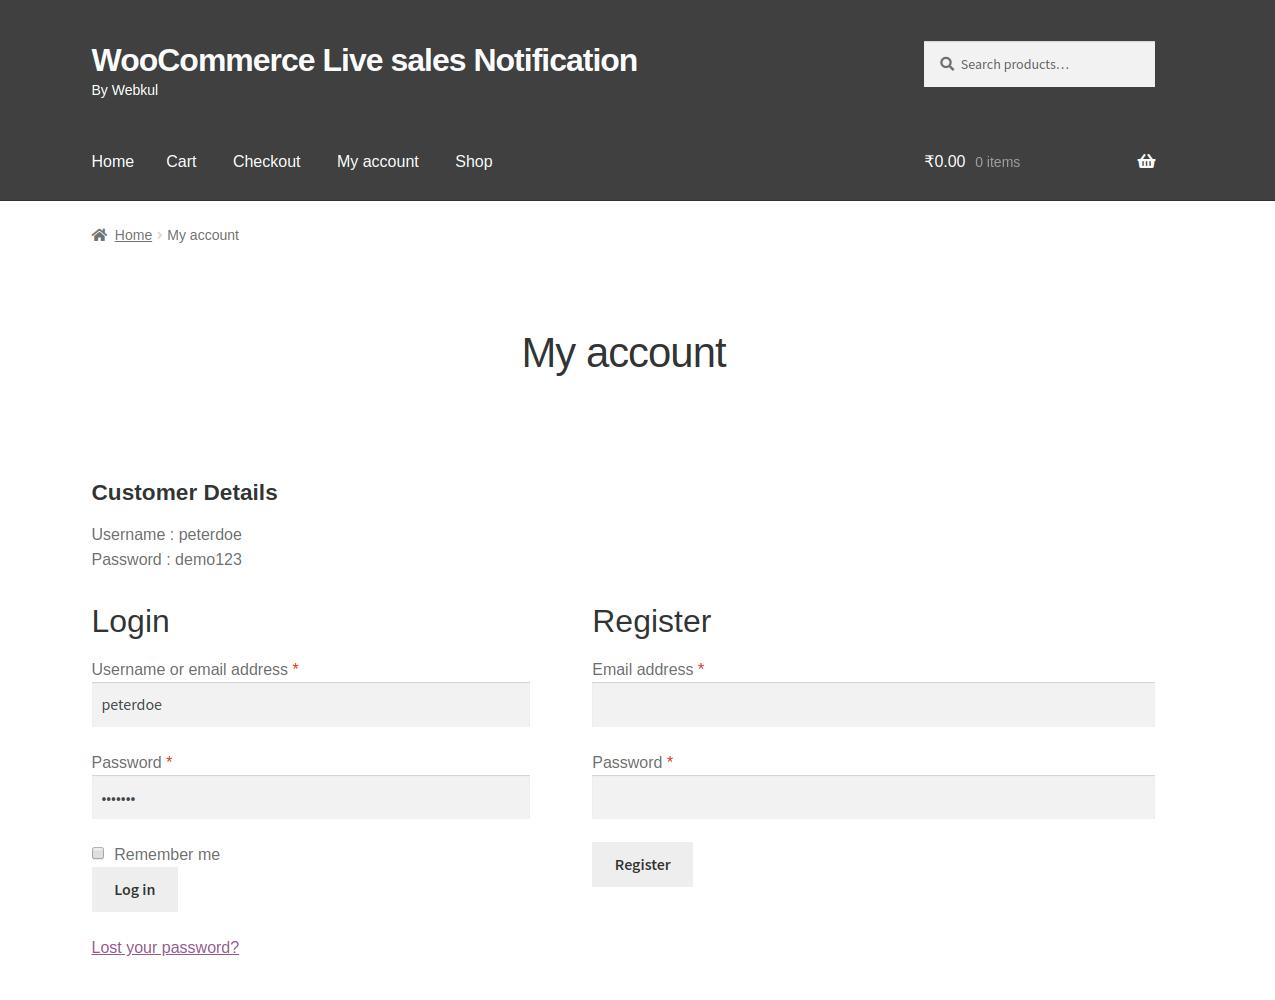 webkul-woocommerce-live-sales-notification-user-frontend-user-login